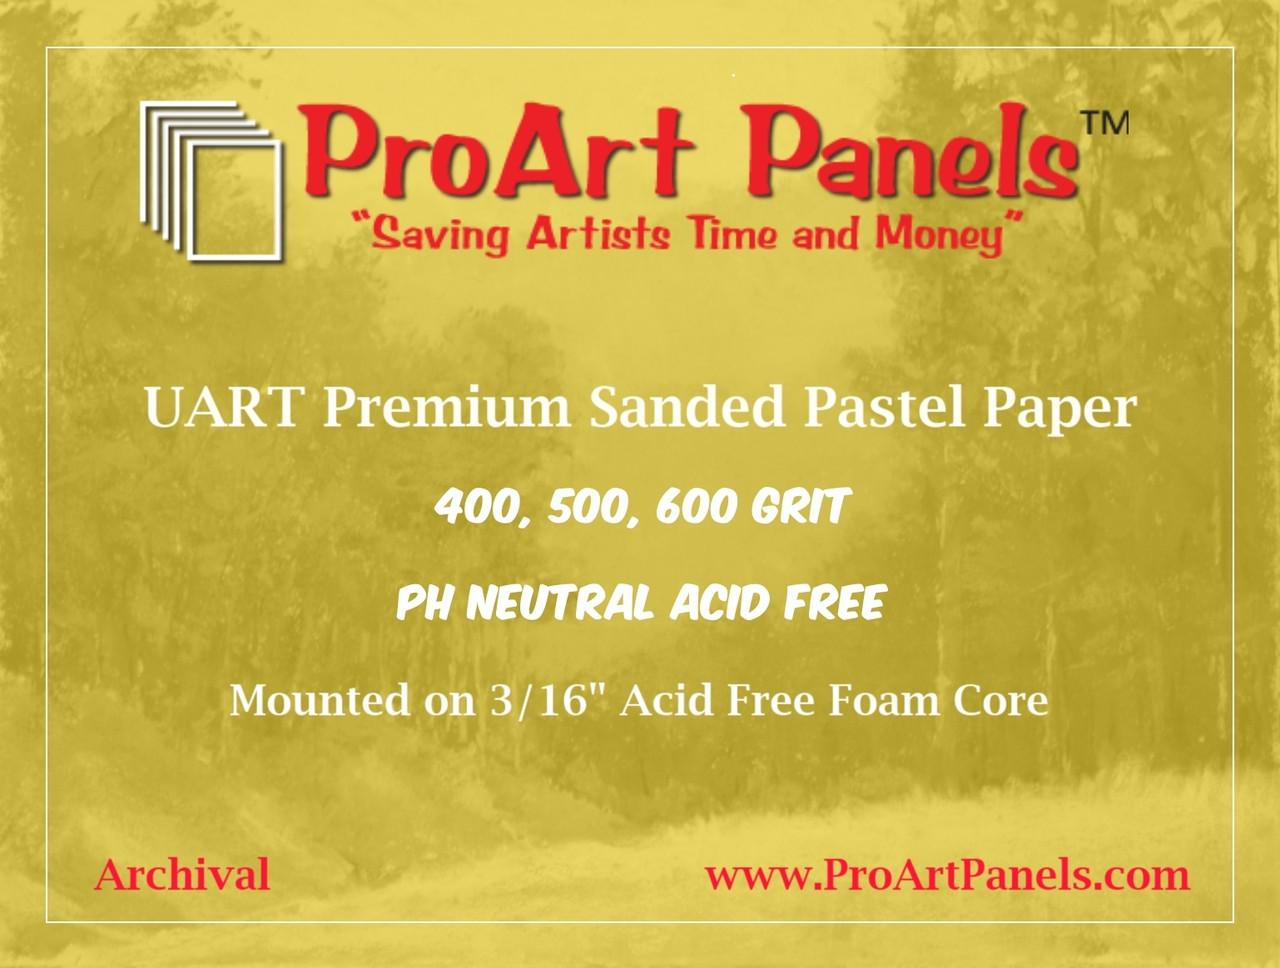 UART 9 x 12 Premium Mounted Board Grade #600